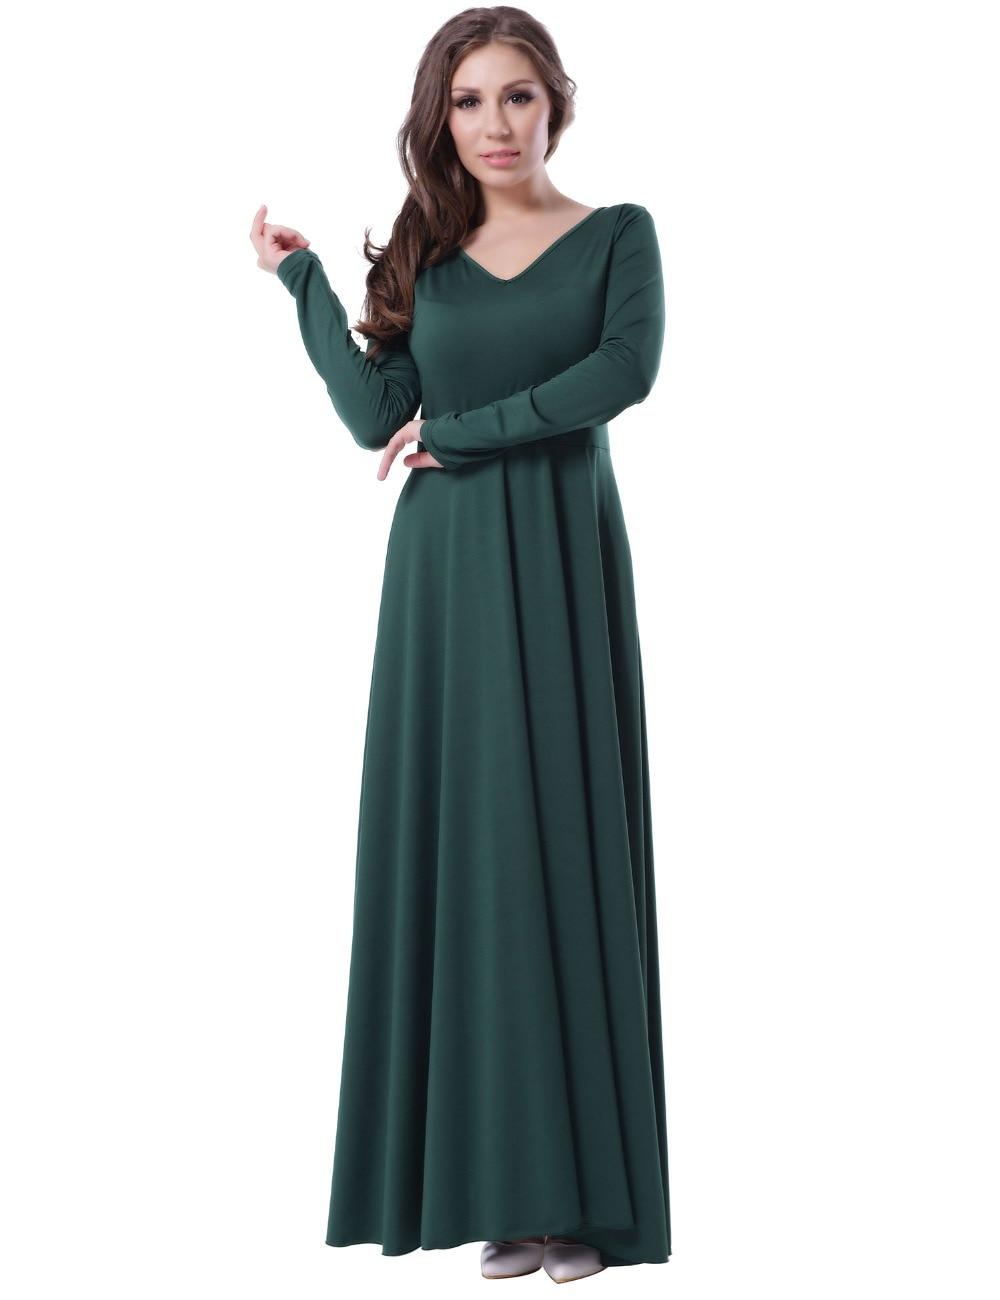 Online Get Cheap Dress Unique -Aliexpress.com | Alibaba Group